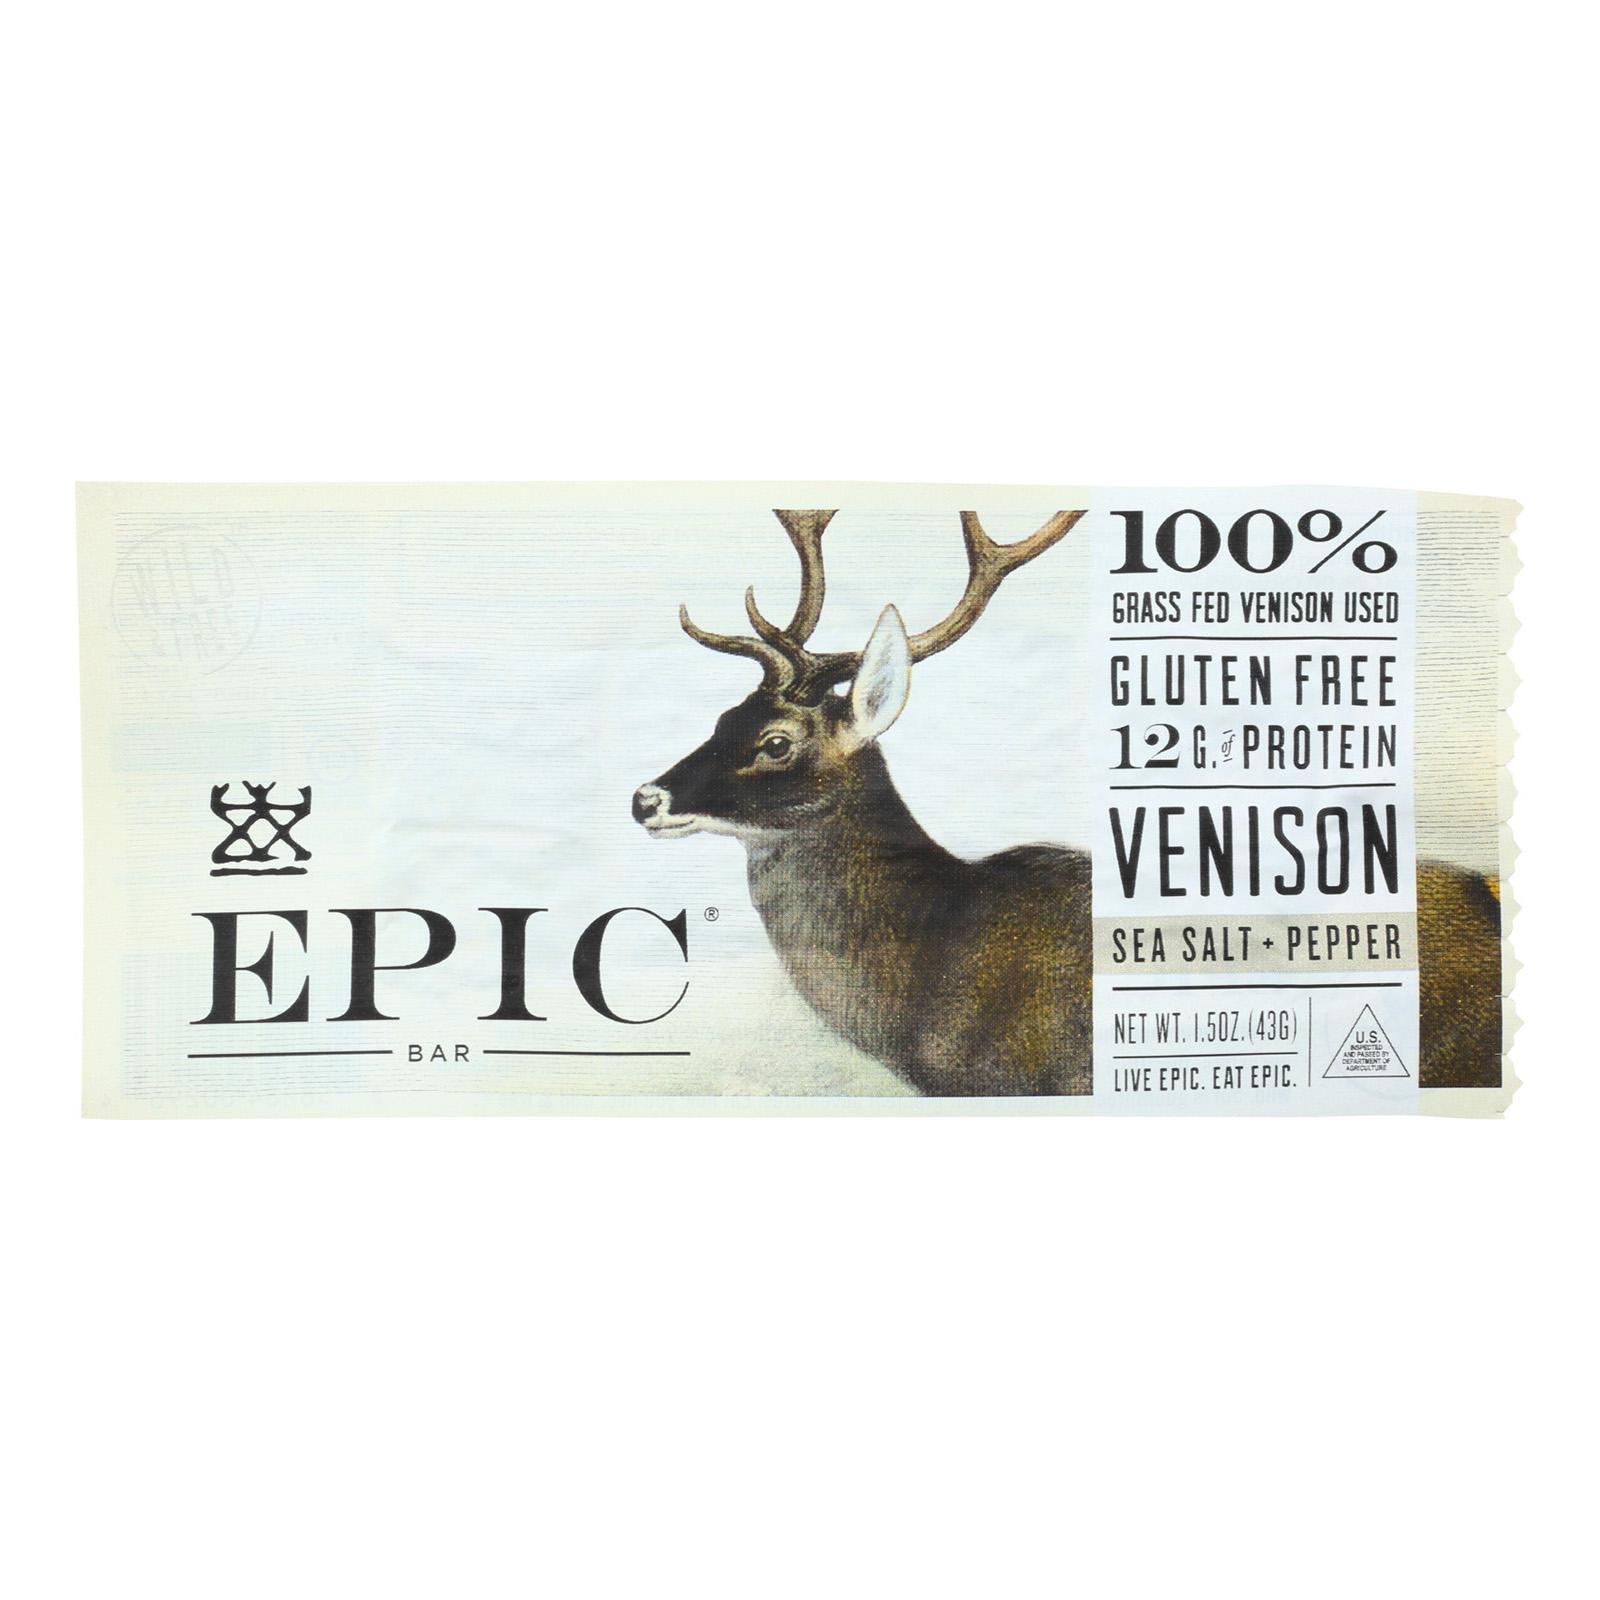 Epic Natural Meat Bar - Venison Sea Salt Pepper - Case Of 12 - 1.5 Oz.